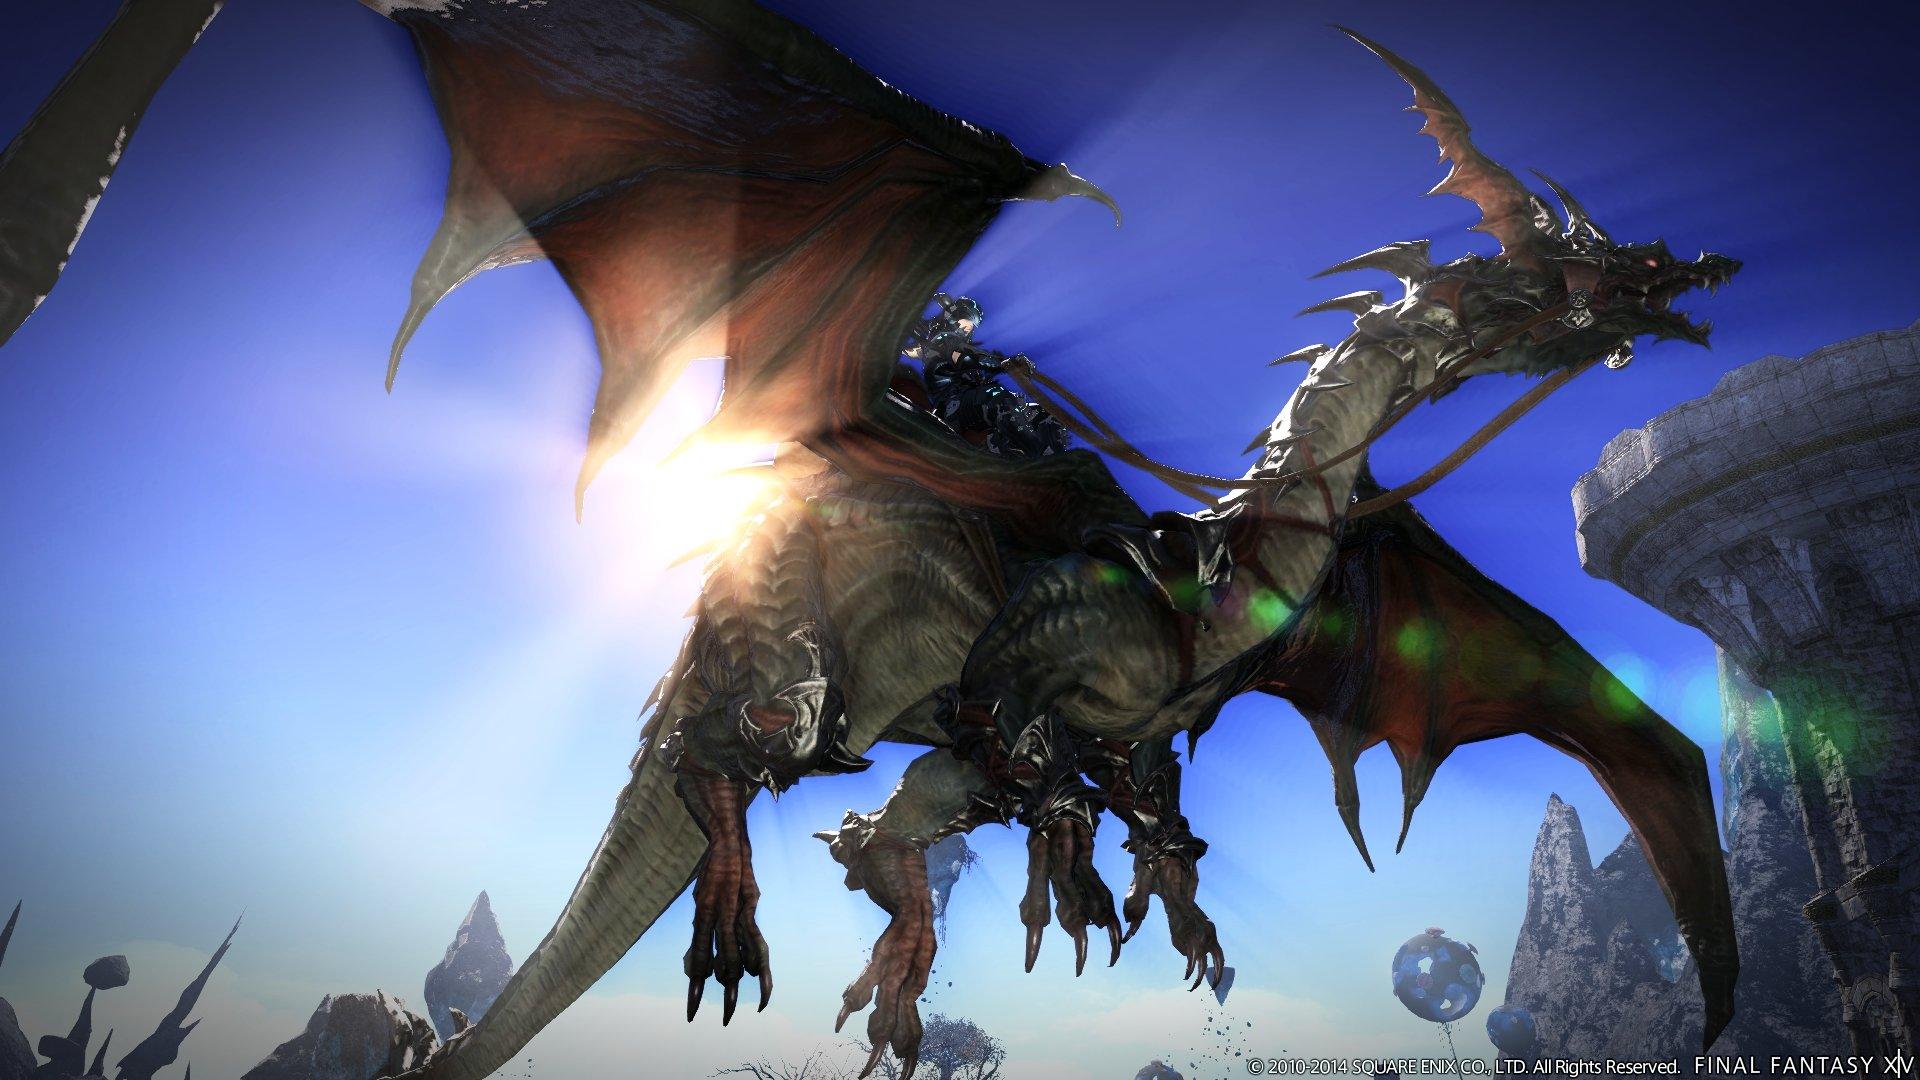 final fantasy xiv online download mac